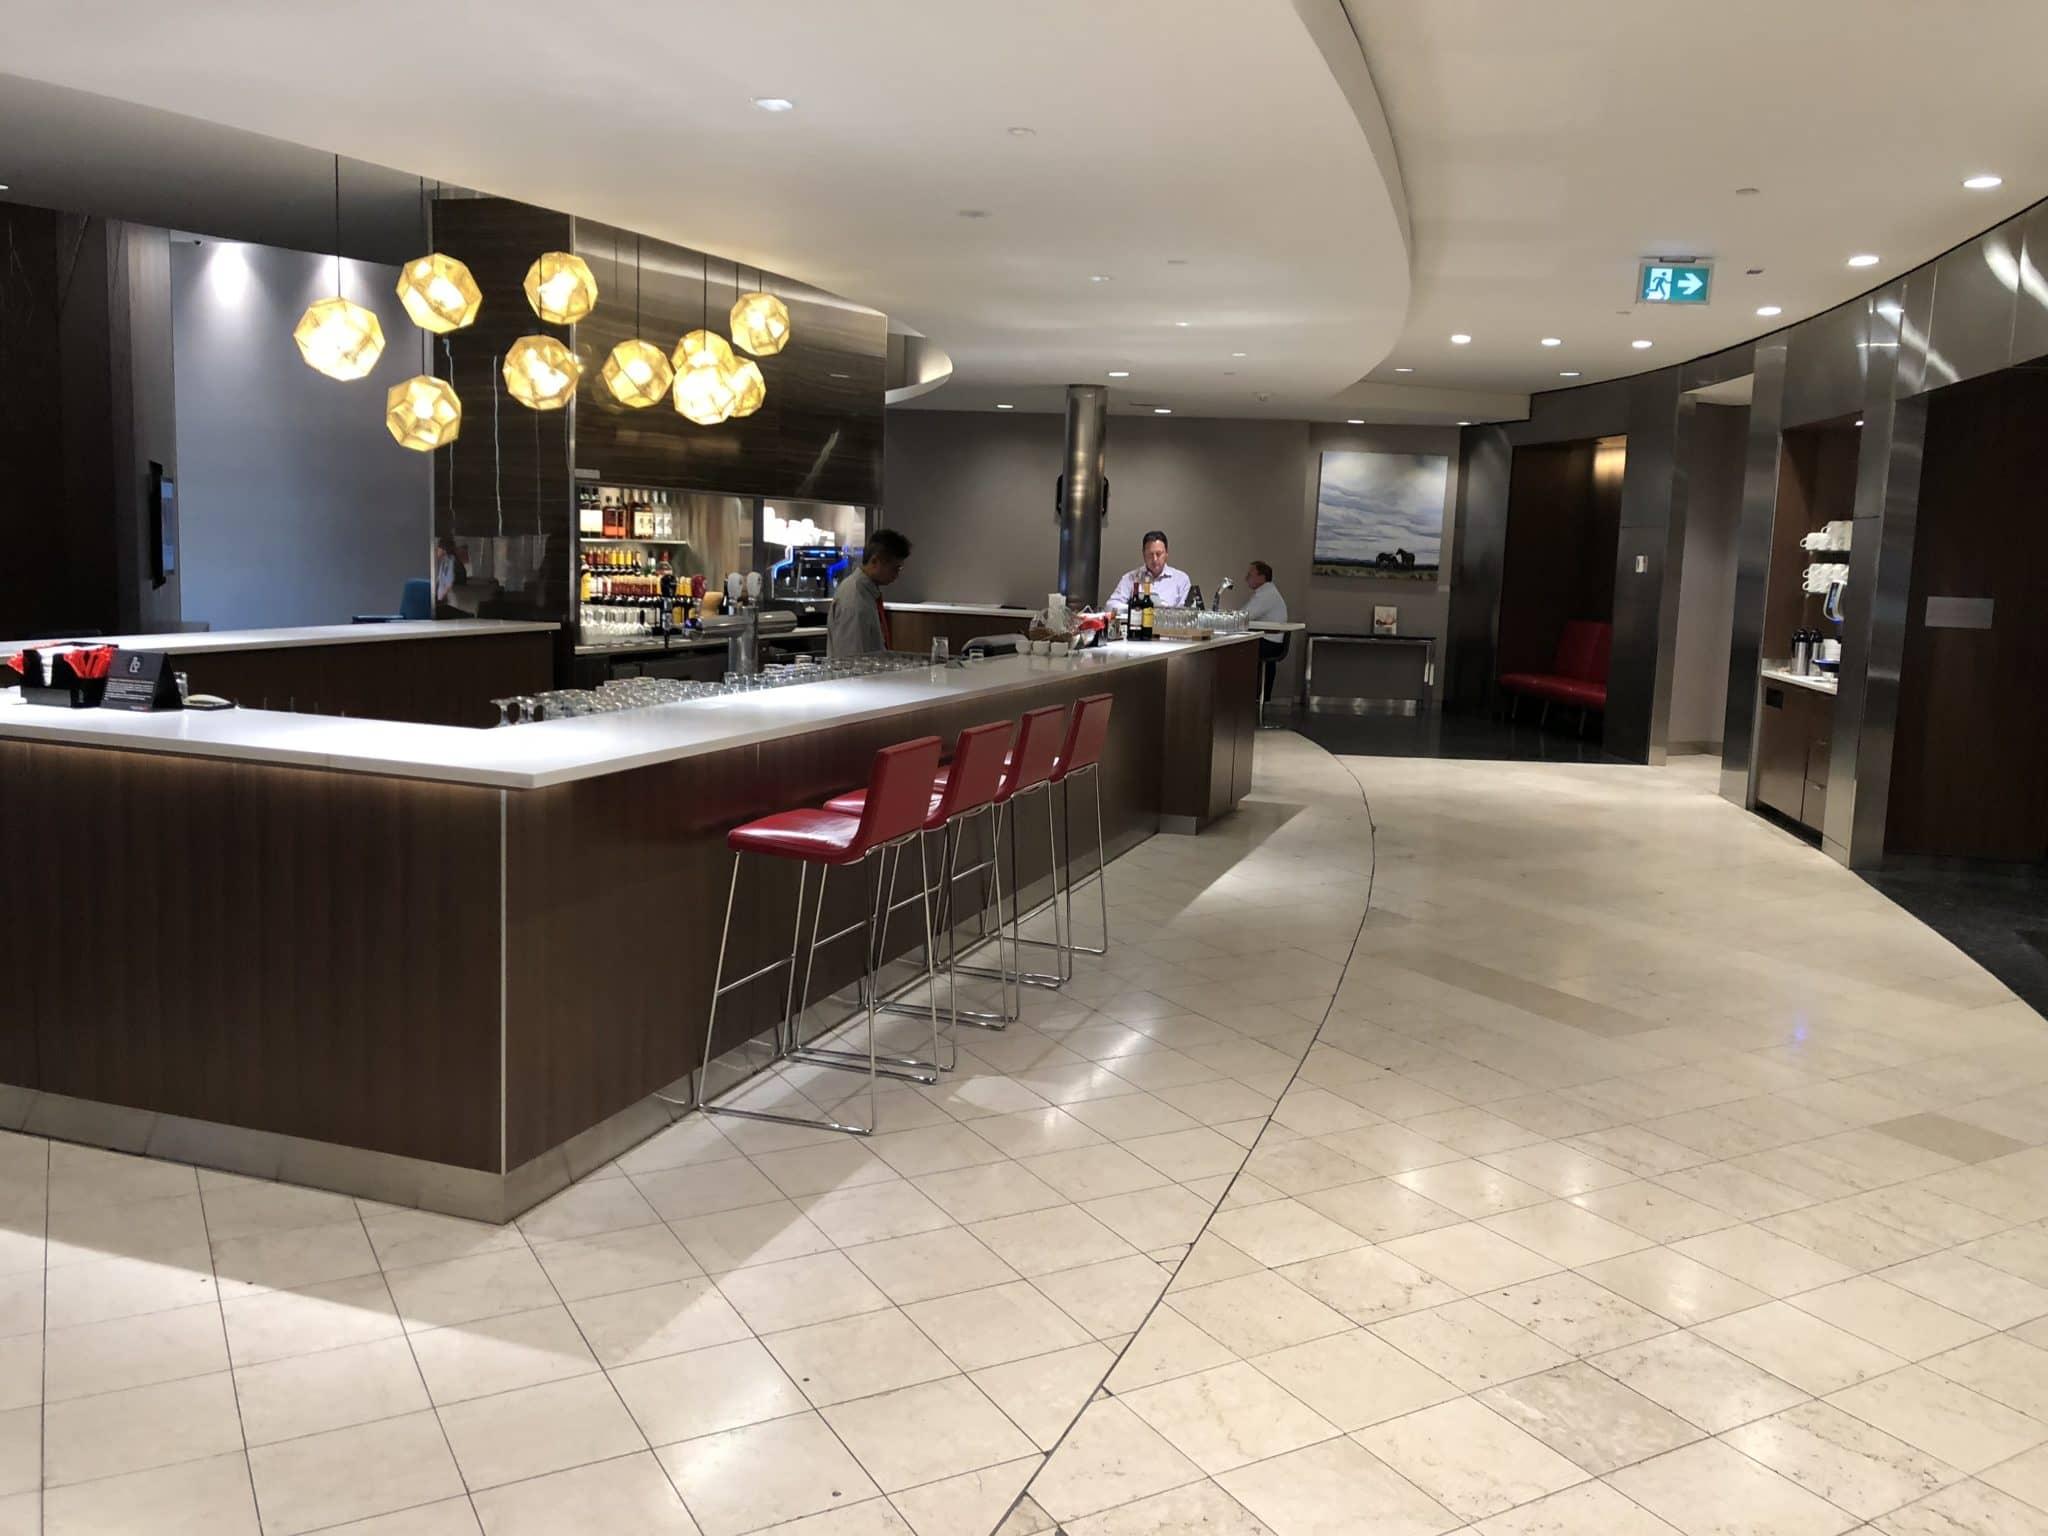 Air Canada Maple Leaf Lounge Calgary Bar in der Lounge